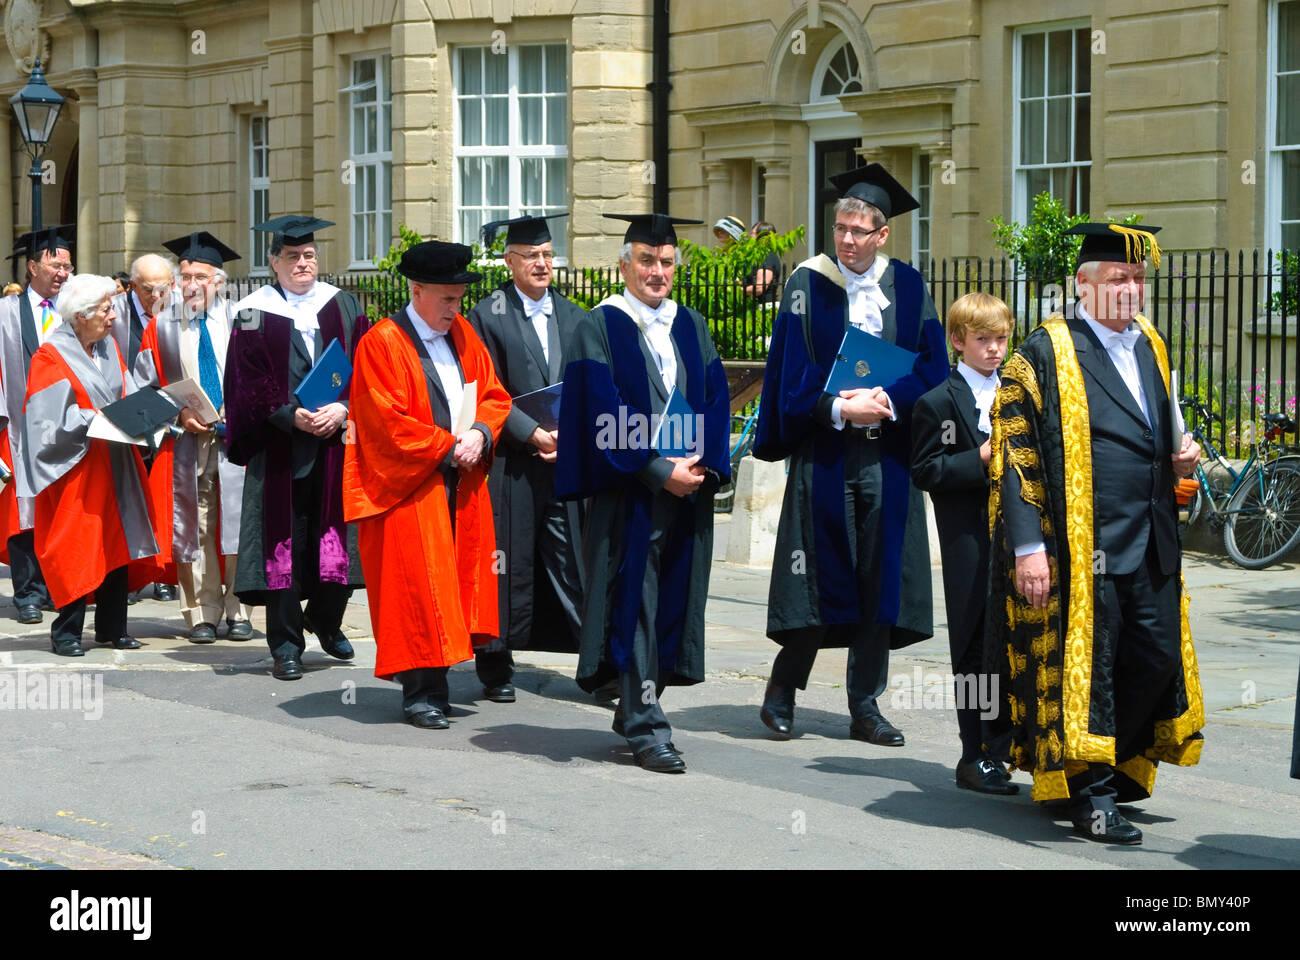 University of Oxford Encaenia Procession 2010 Stock Photo